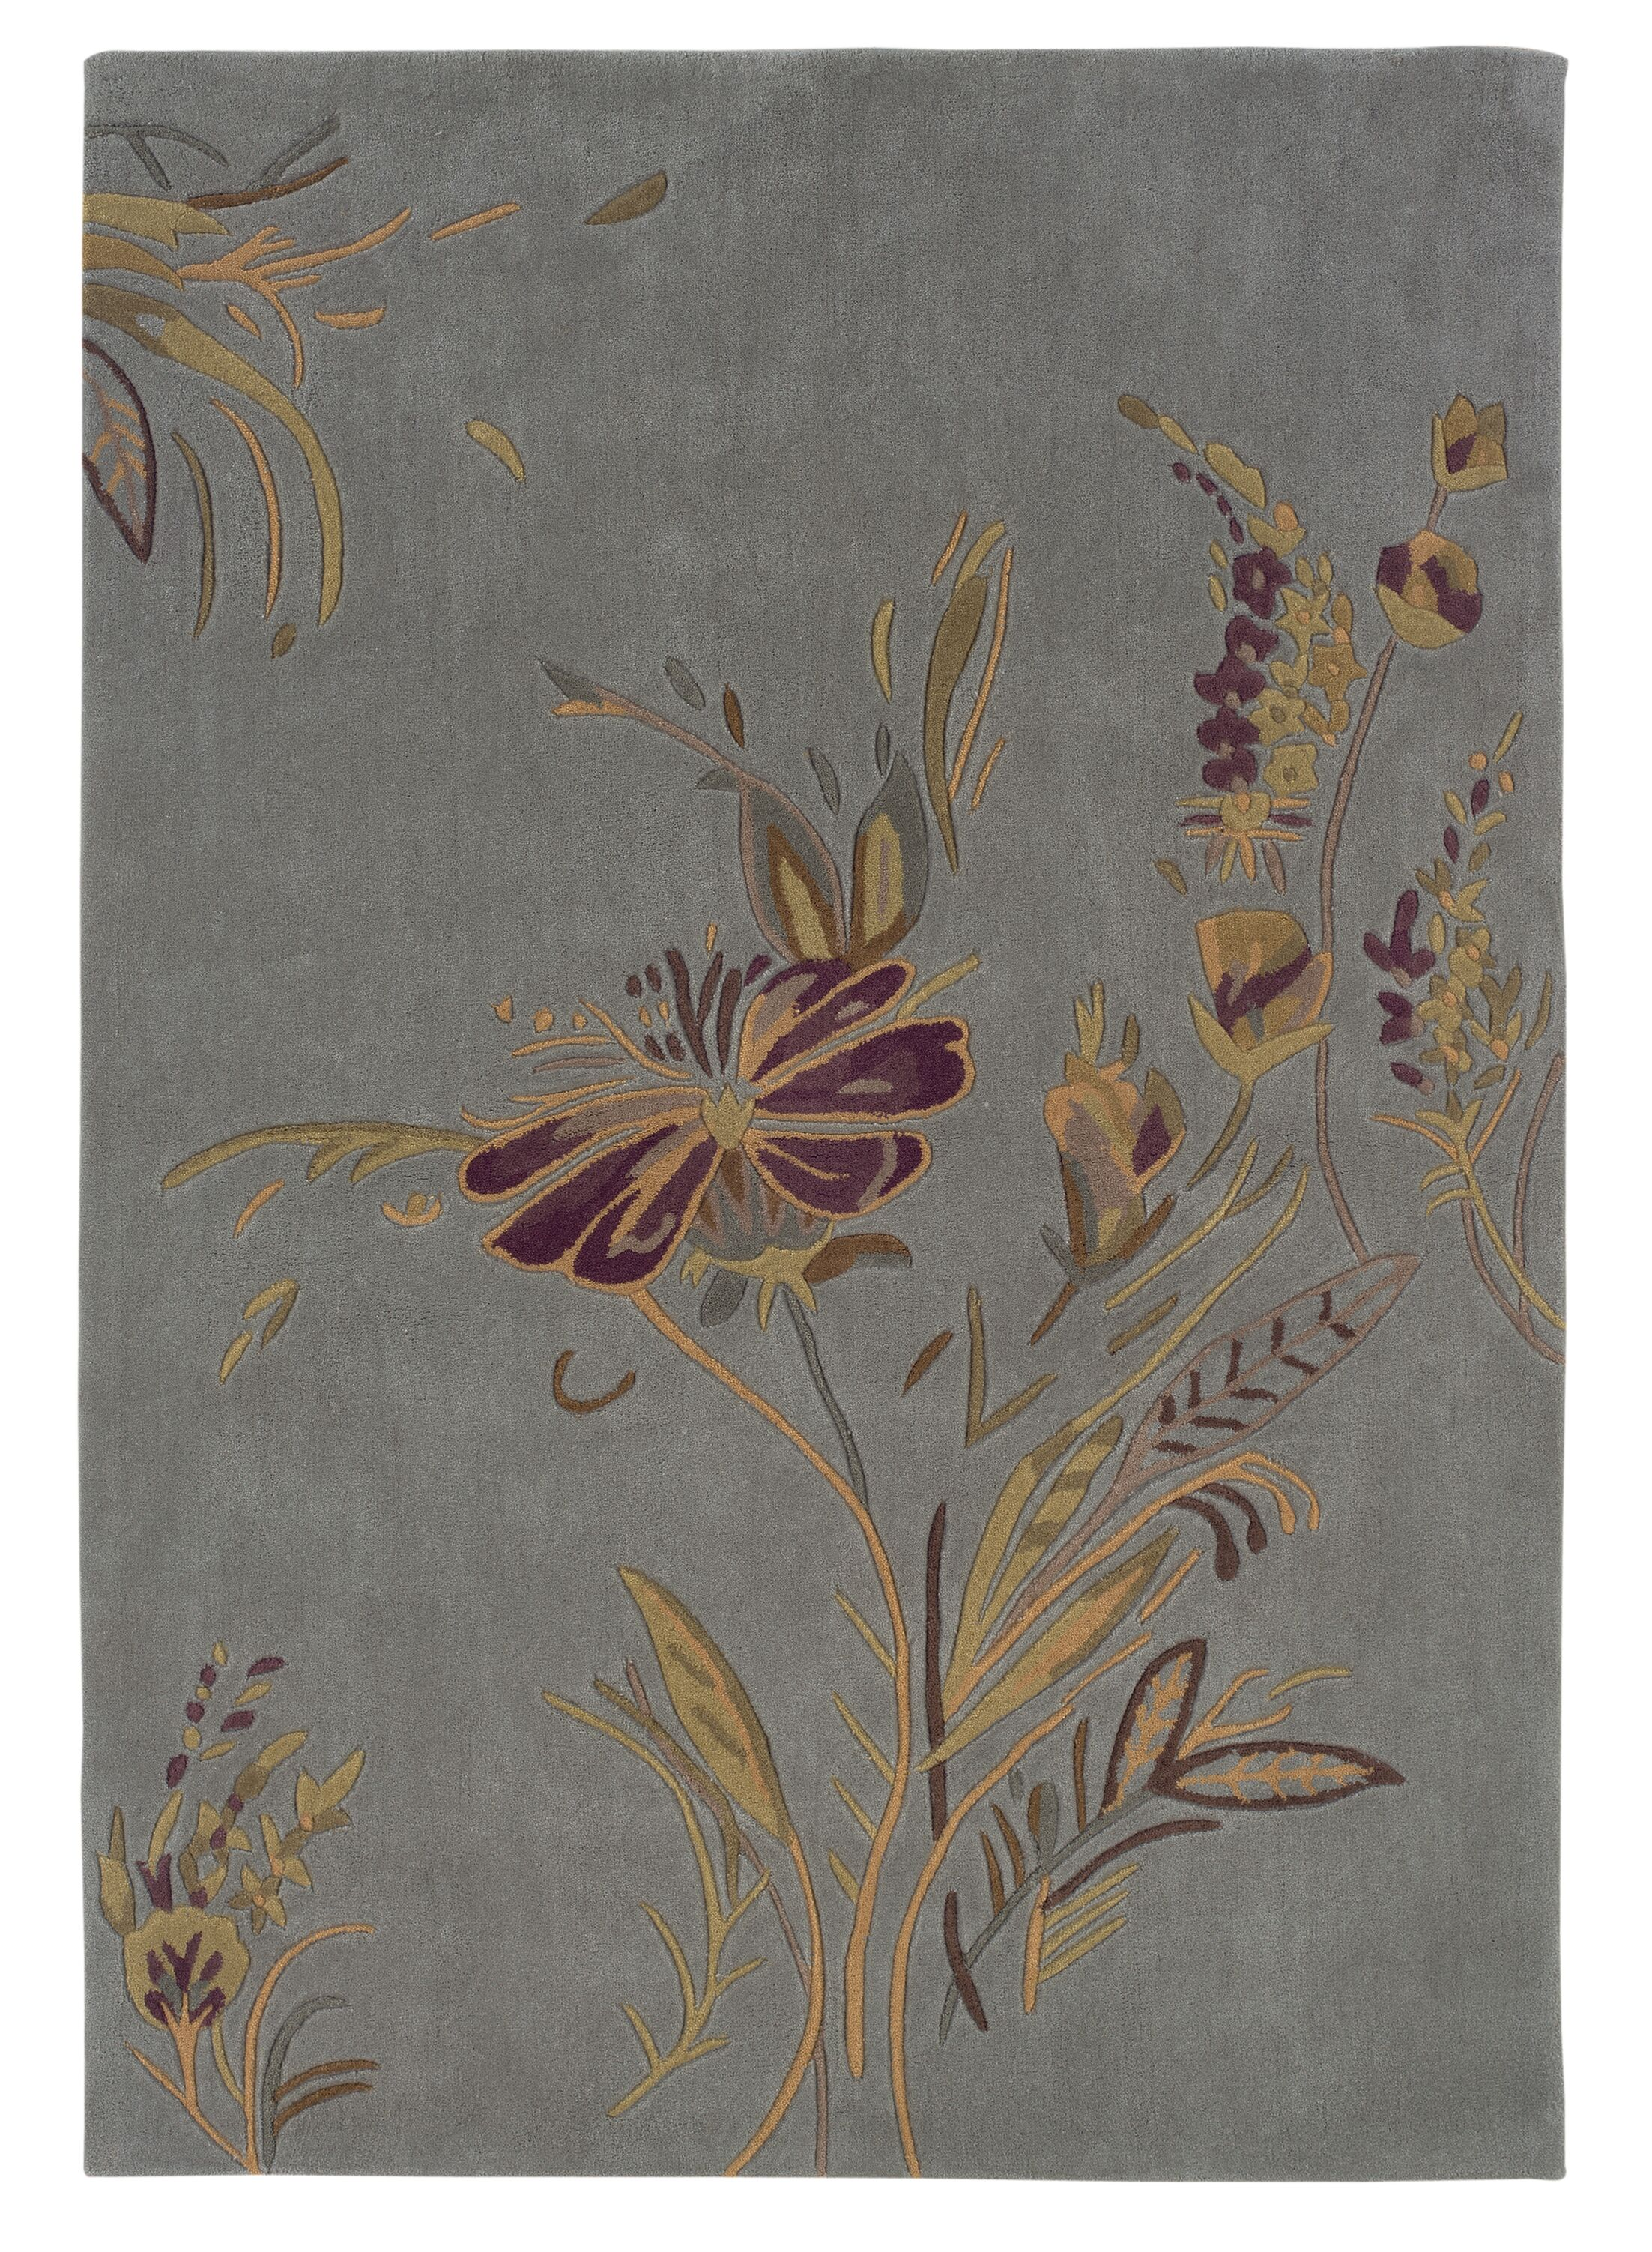 Columban Hand-Tufted Blue/Gold Area Rug Rug Size: Rectangle 8' x 10'